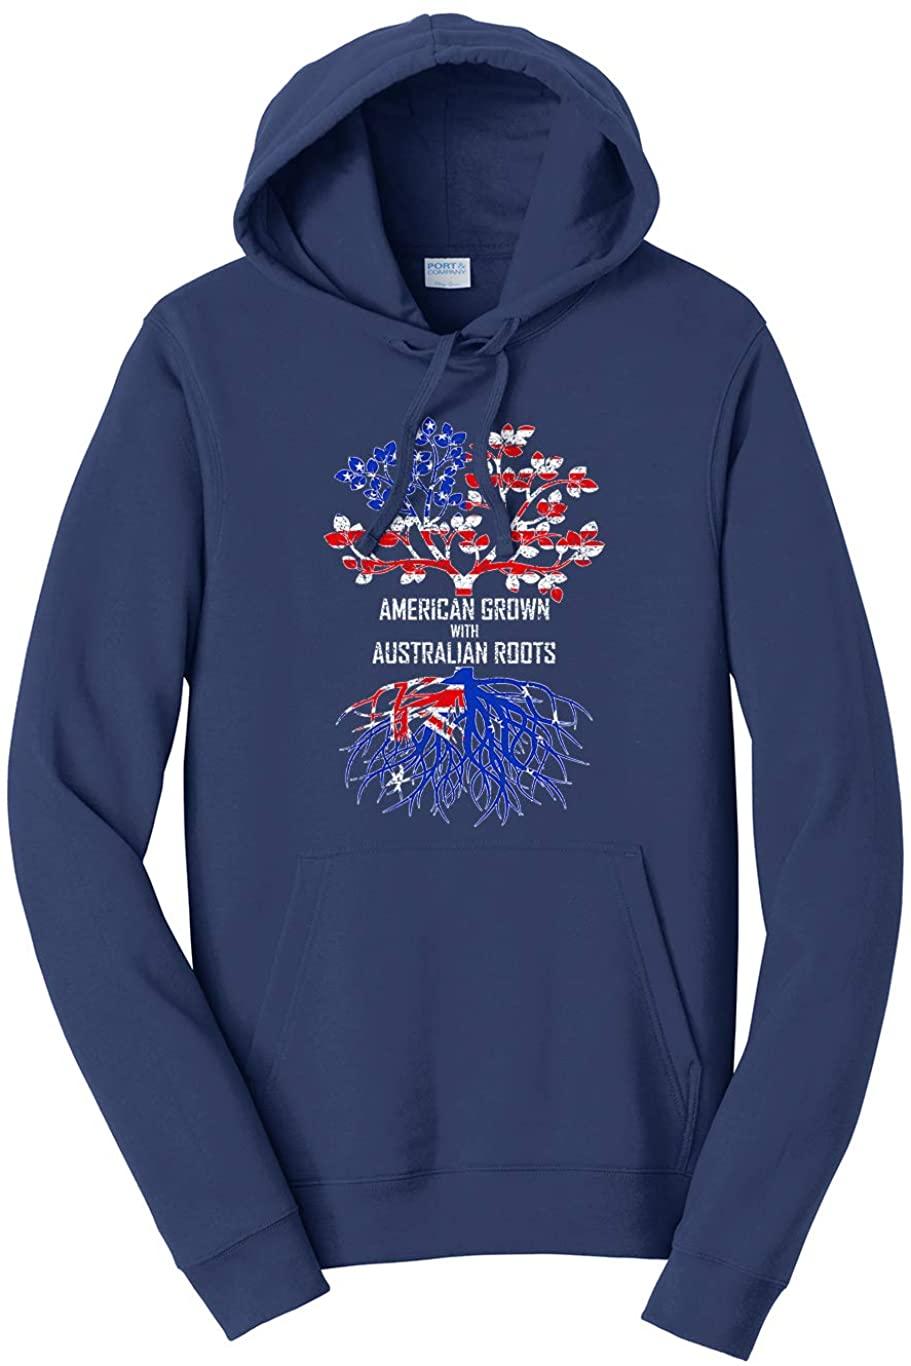 Tenacitee Unisex American Grown with Australian Roots Hooded Sweatshirt